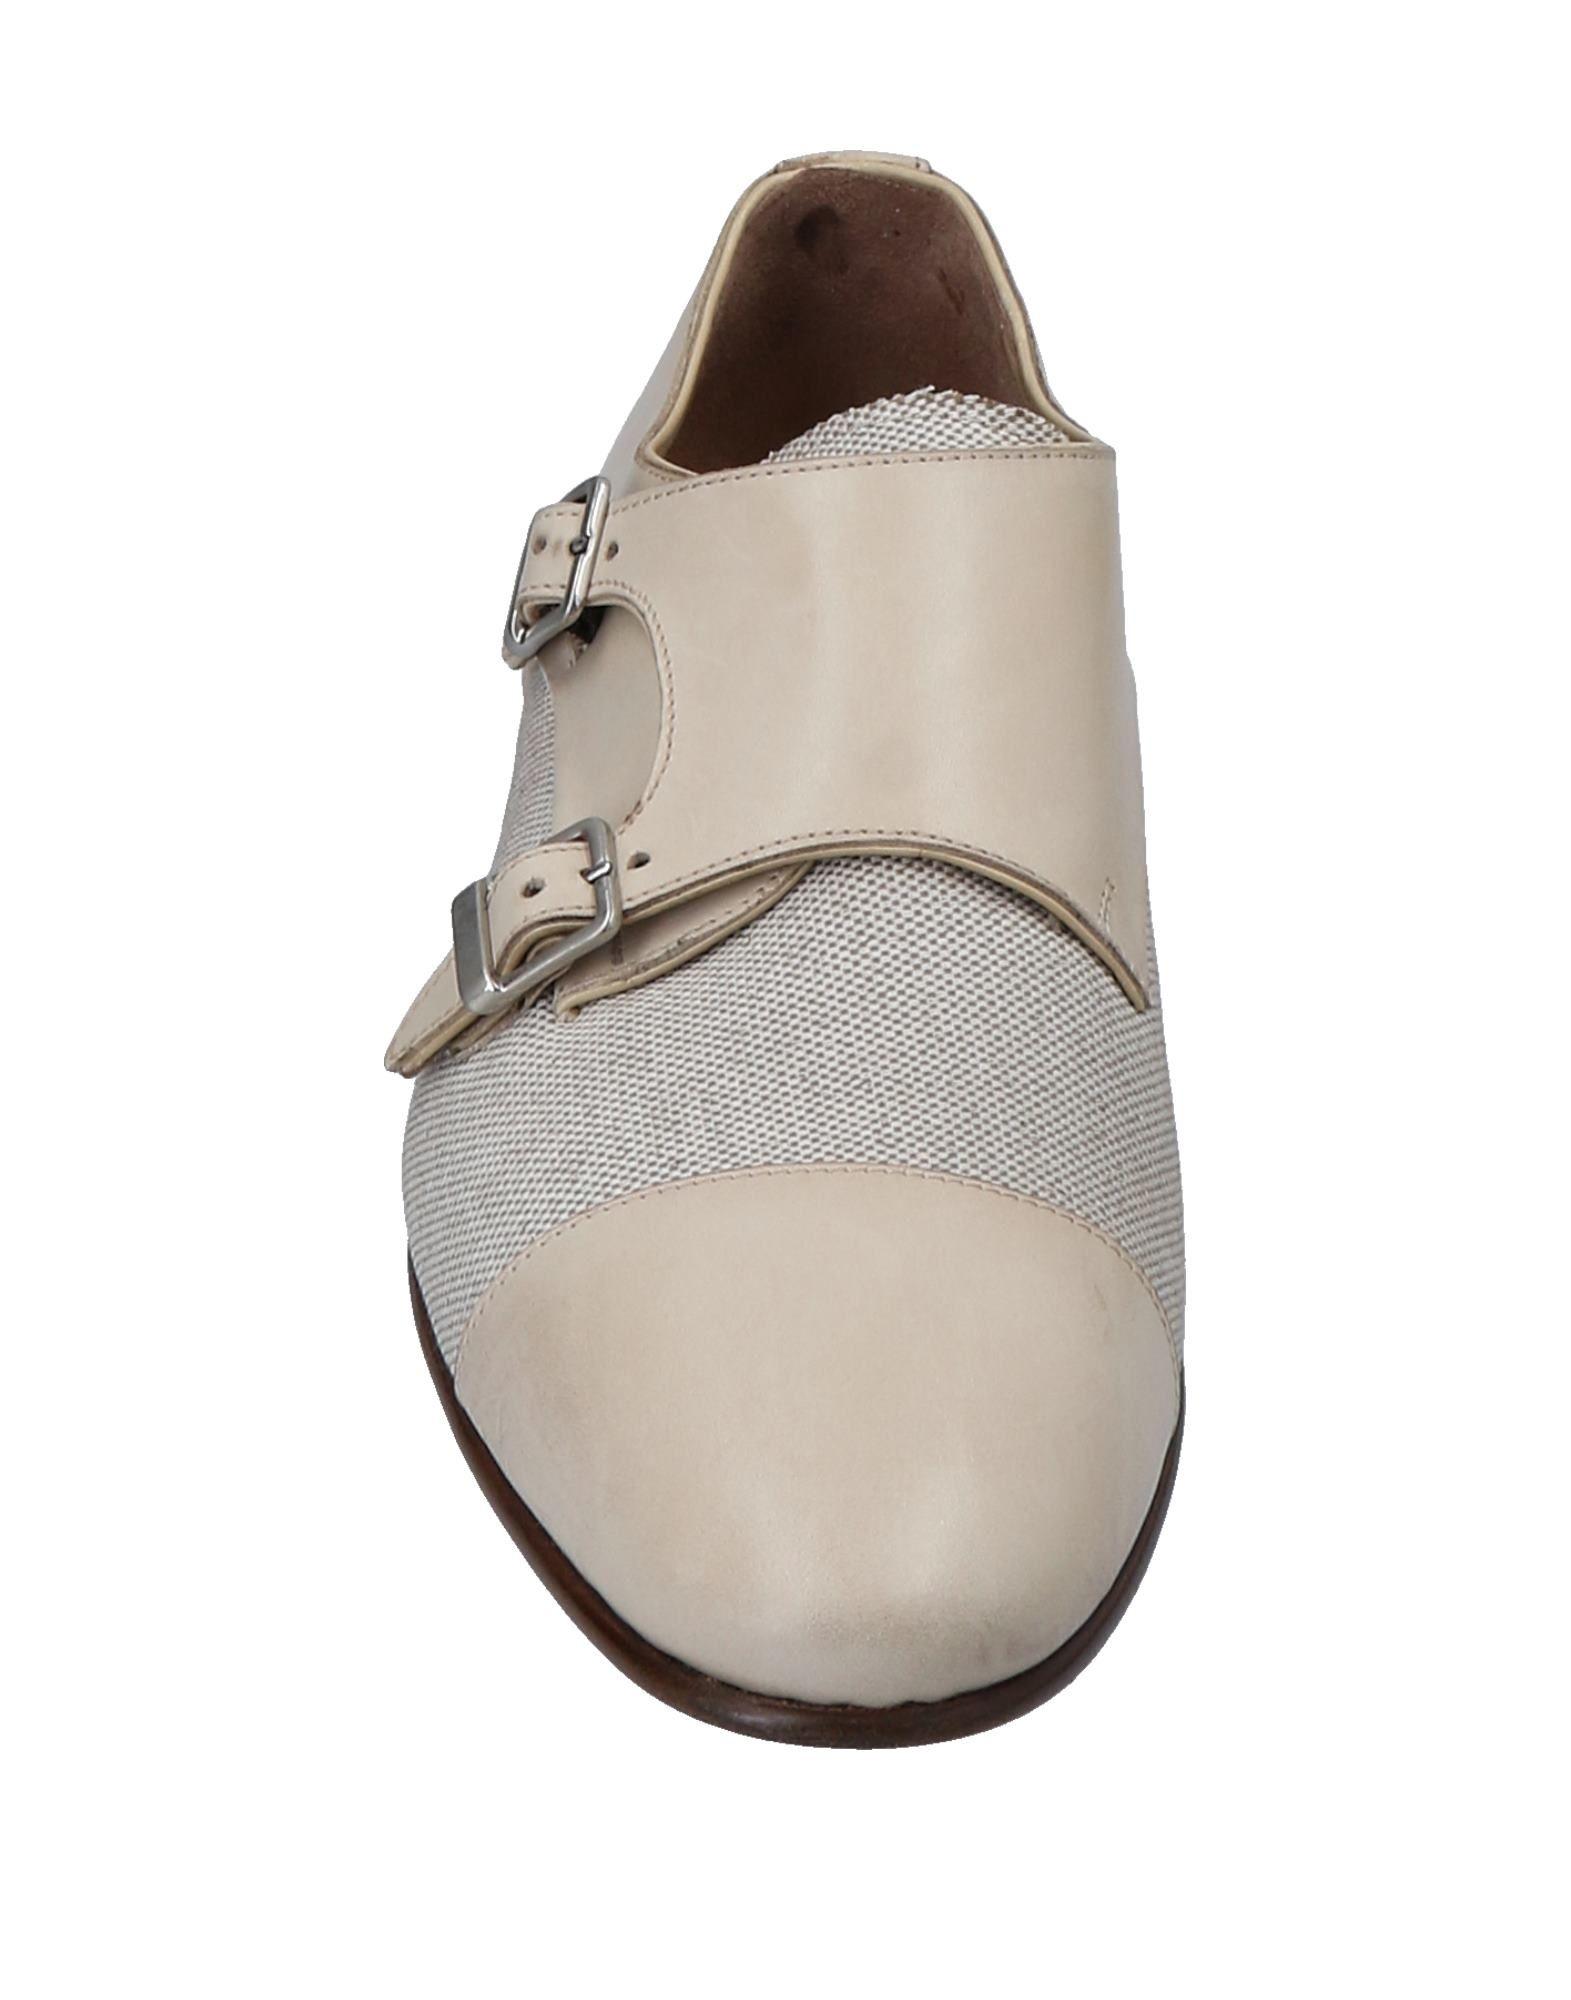 Calpierre Gute Mokassins Herren  11551897LN Gute Calpierre Qualität beliebte Schuhe 37abc3